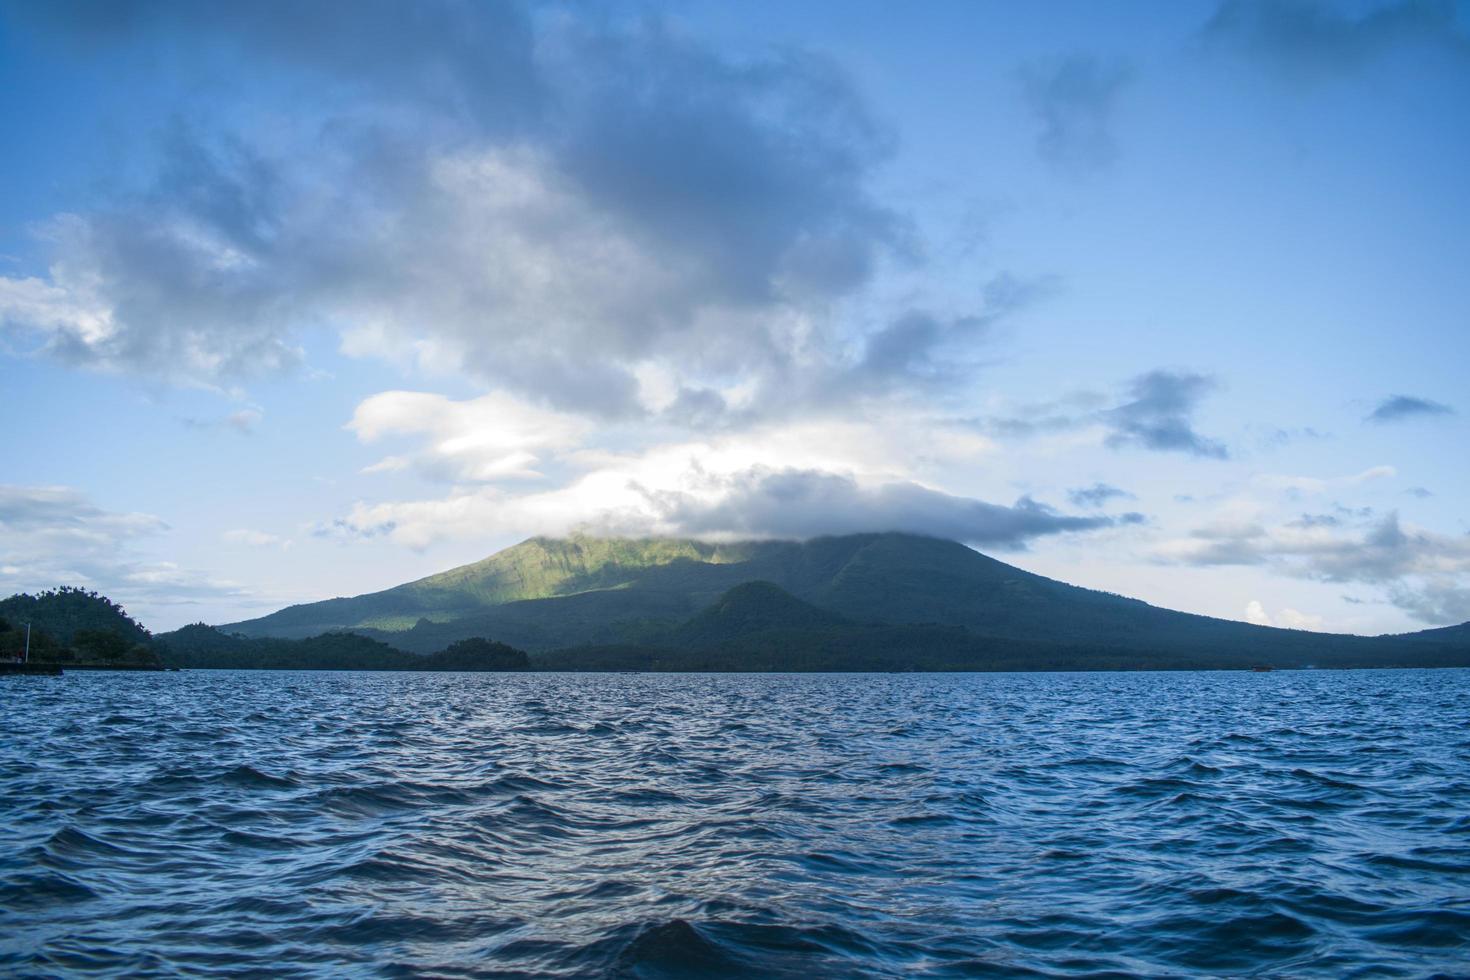 Ozean nahe Berg mit Wolken foto